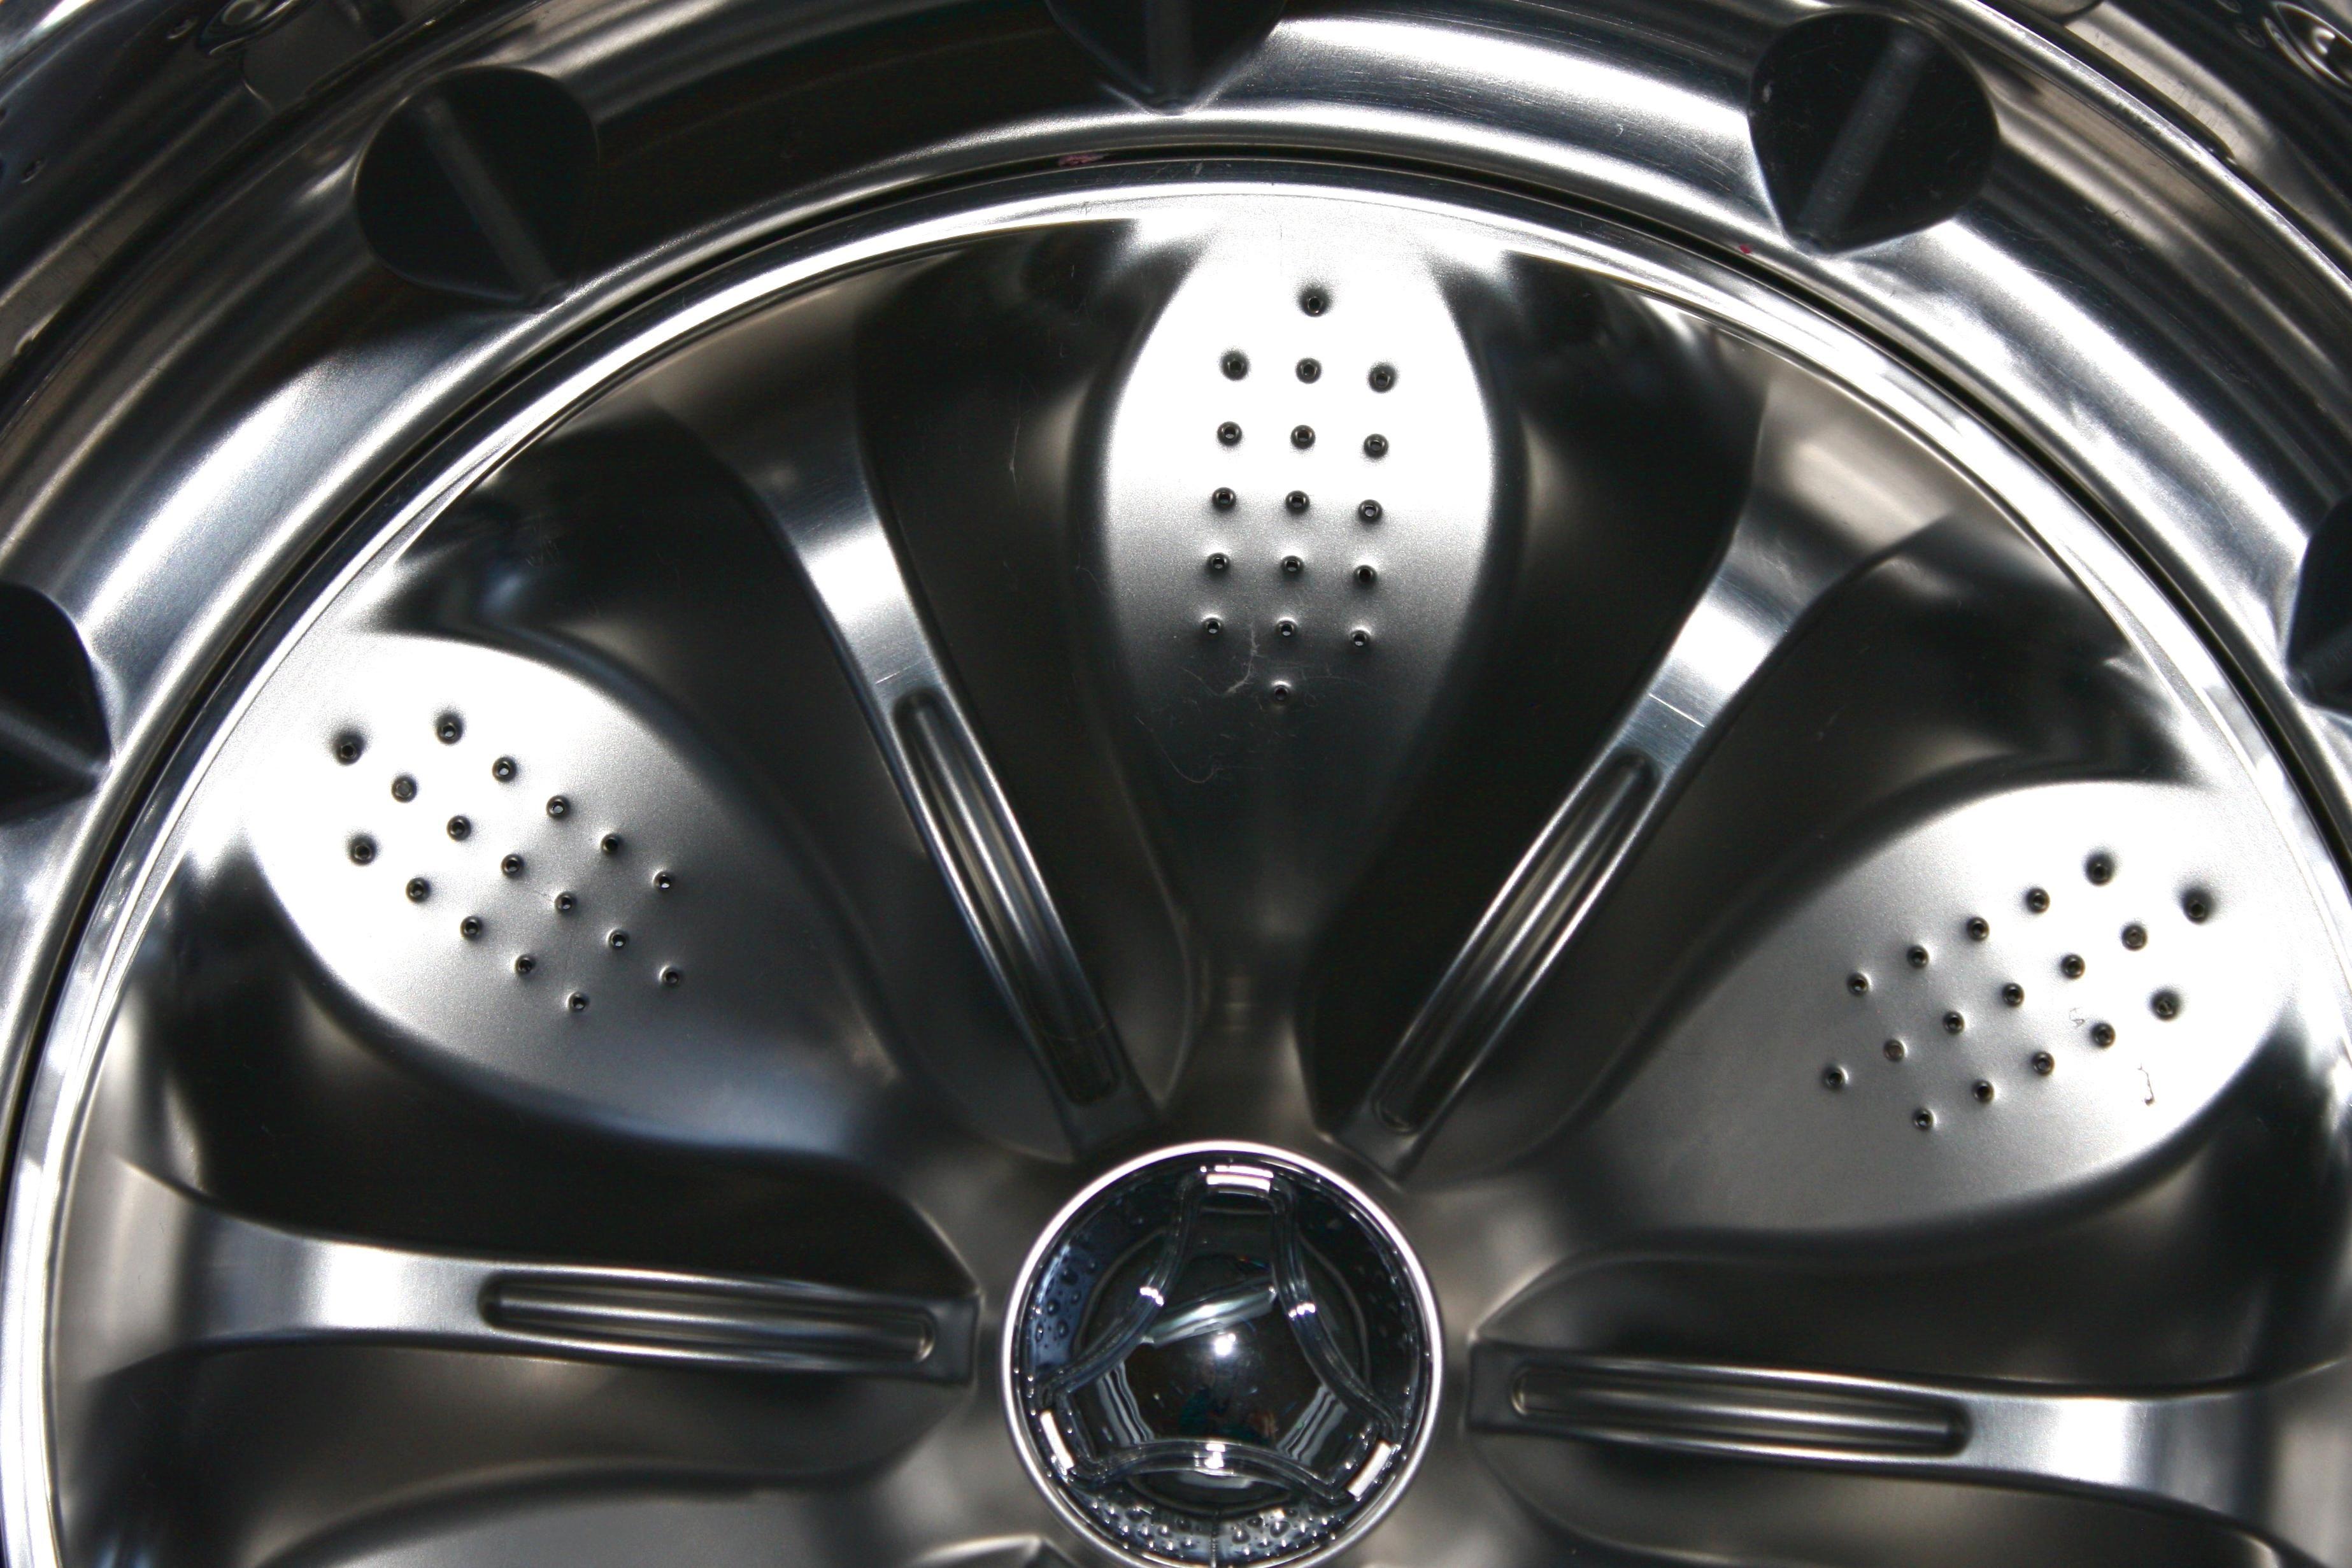 Free picture stainless steel washing machine drum